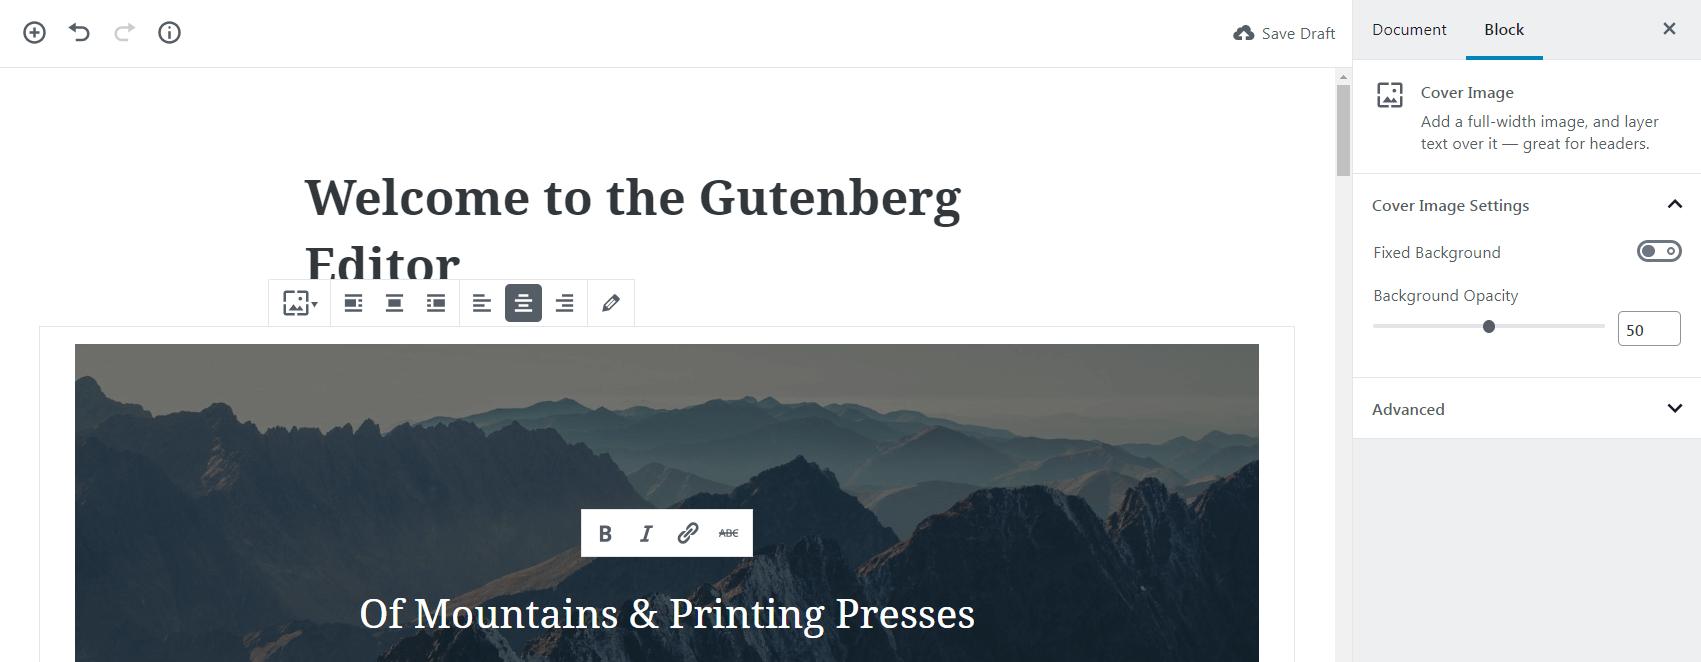 Gutenberg image block settings.